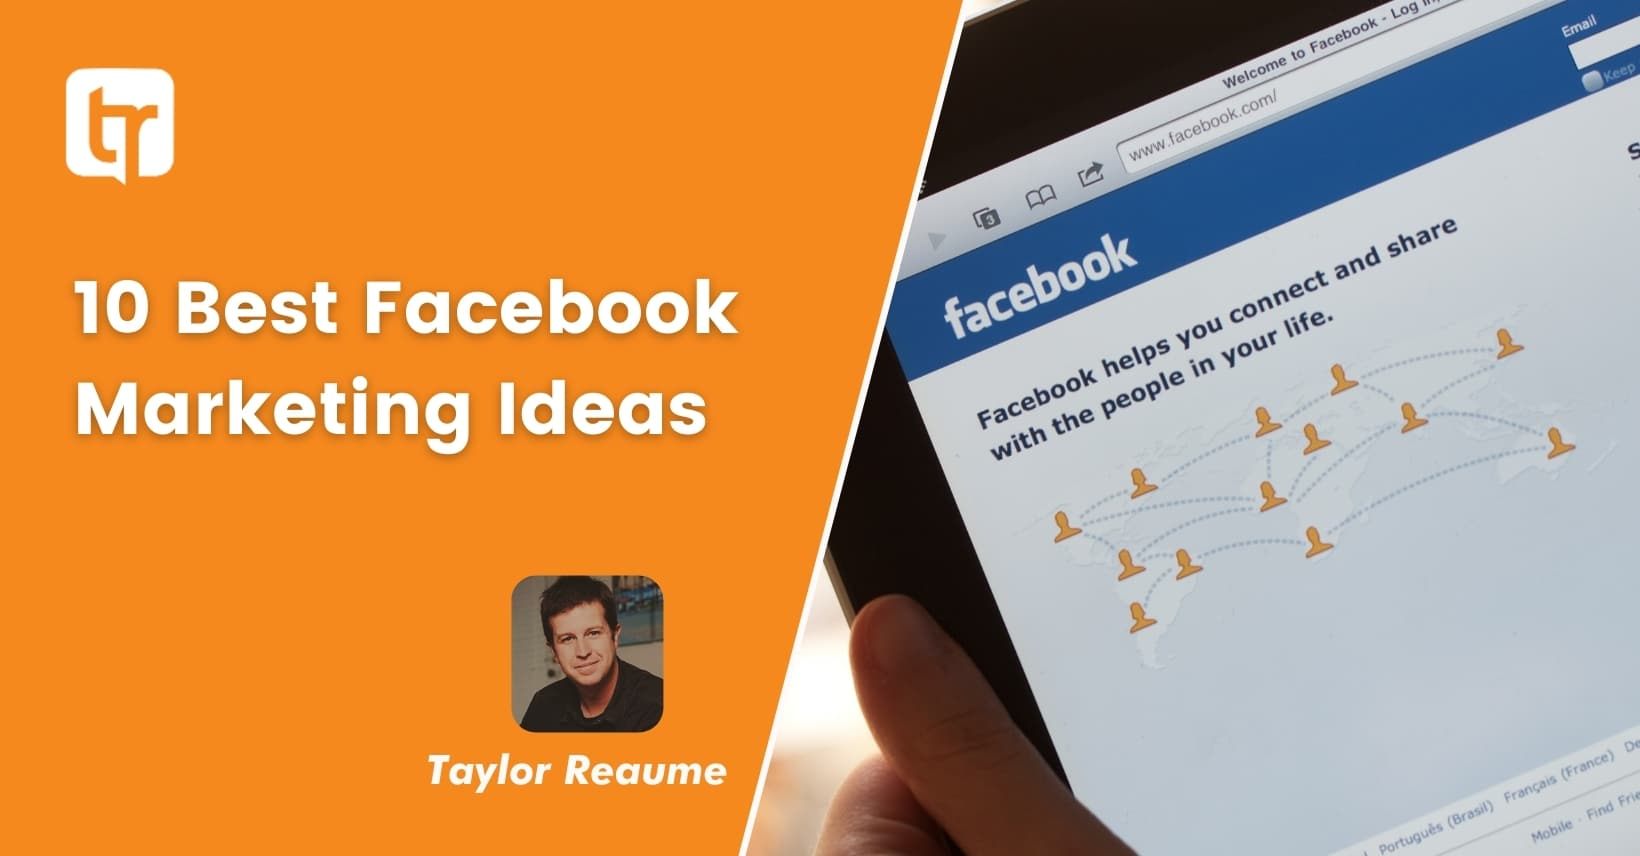 10 Best Facebook Marketing Ideas